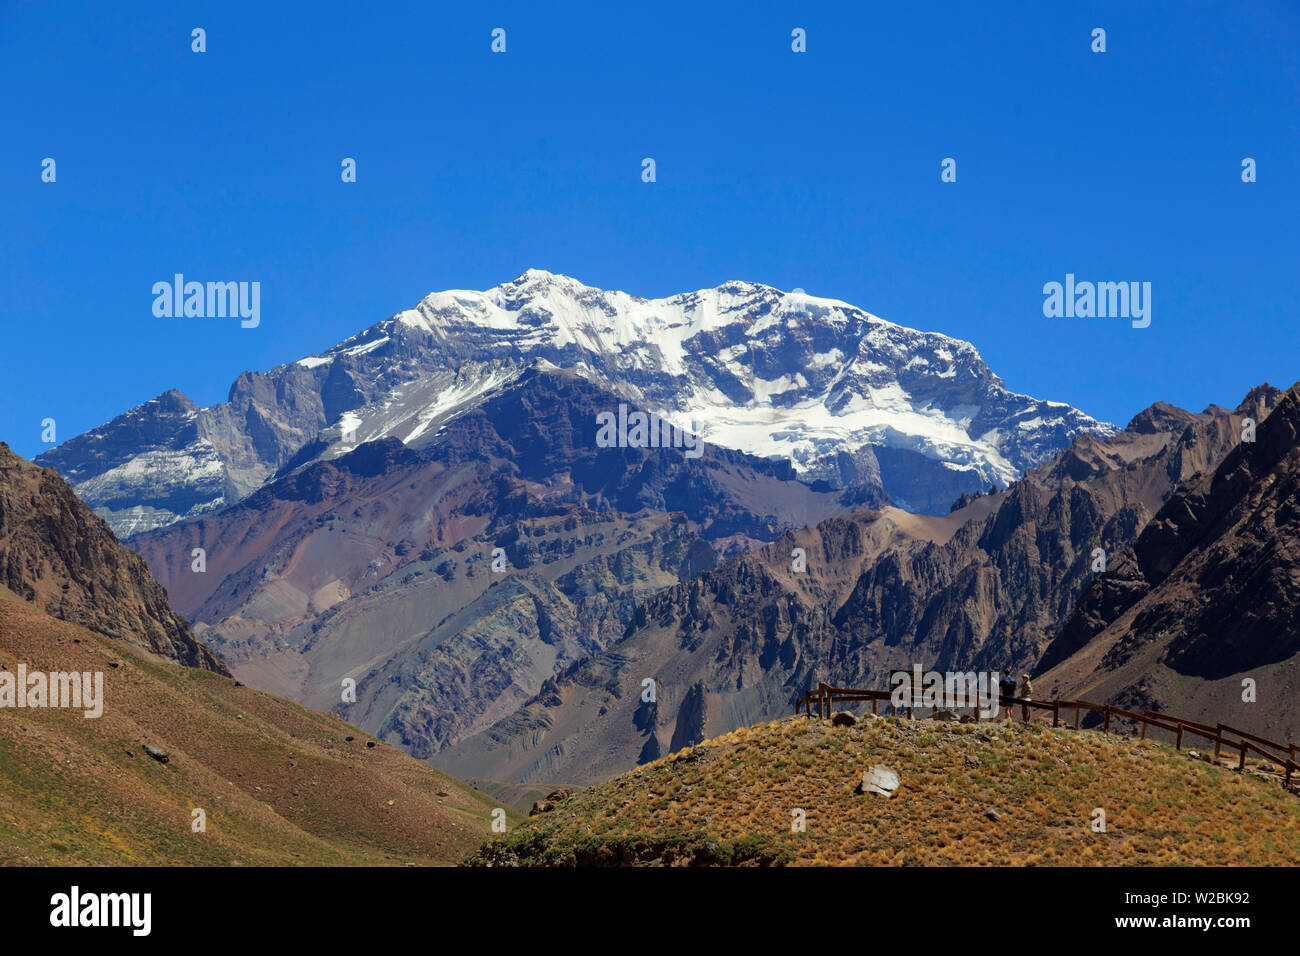 Argentina, Mendoza, Aconcagua Pronvicial Park, Mt Aconcagua (6692m tallest mountain outside the Himalayan Range) - Stock Image